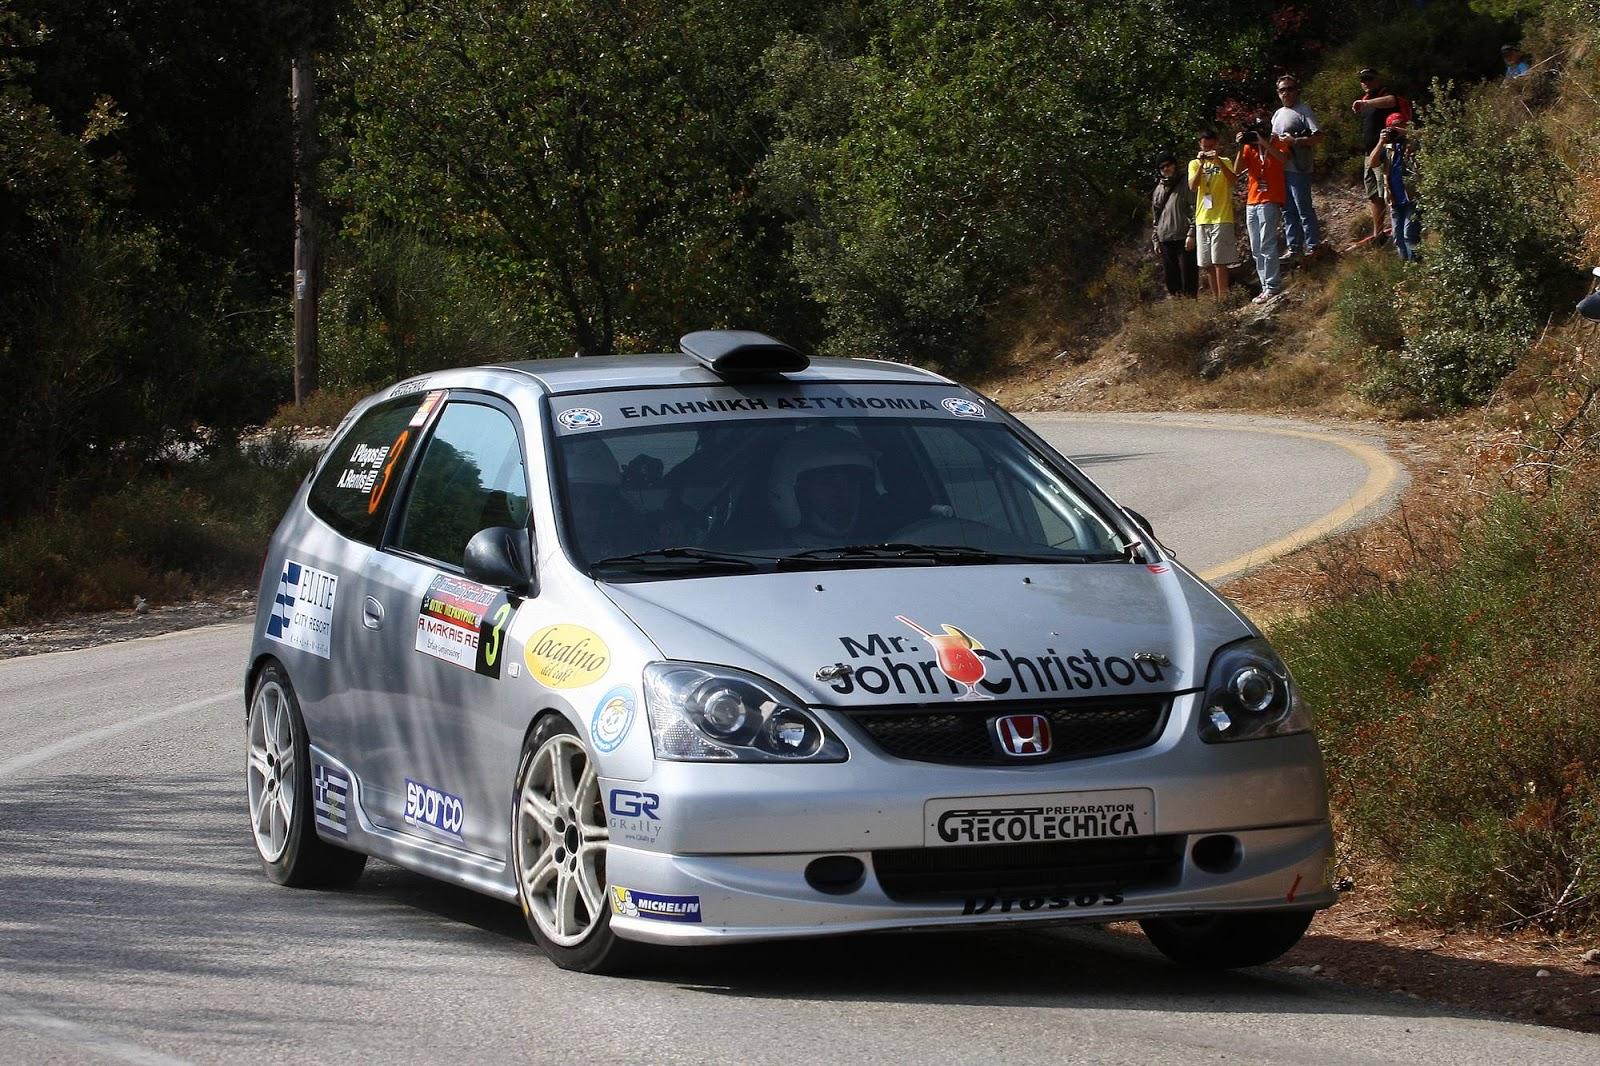 25CE25A025CE25BB25CE25AC25CE25B325CE25BF25CF2582 25CE25A125CE25AD25CE25BD25CF258425CE25B725CF2582 Ολοκληρώθηκε το 4ο Athens Rally Sprint με νικητή τον Πλάγο με Honda Civic Type-R